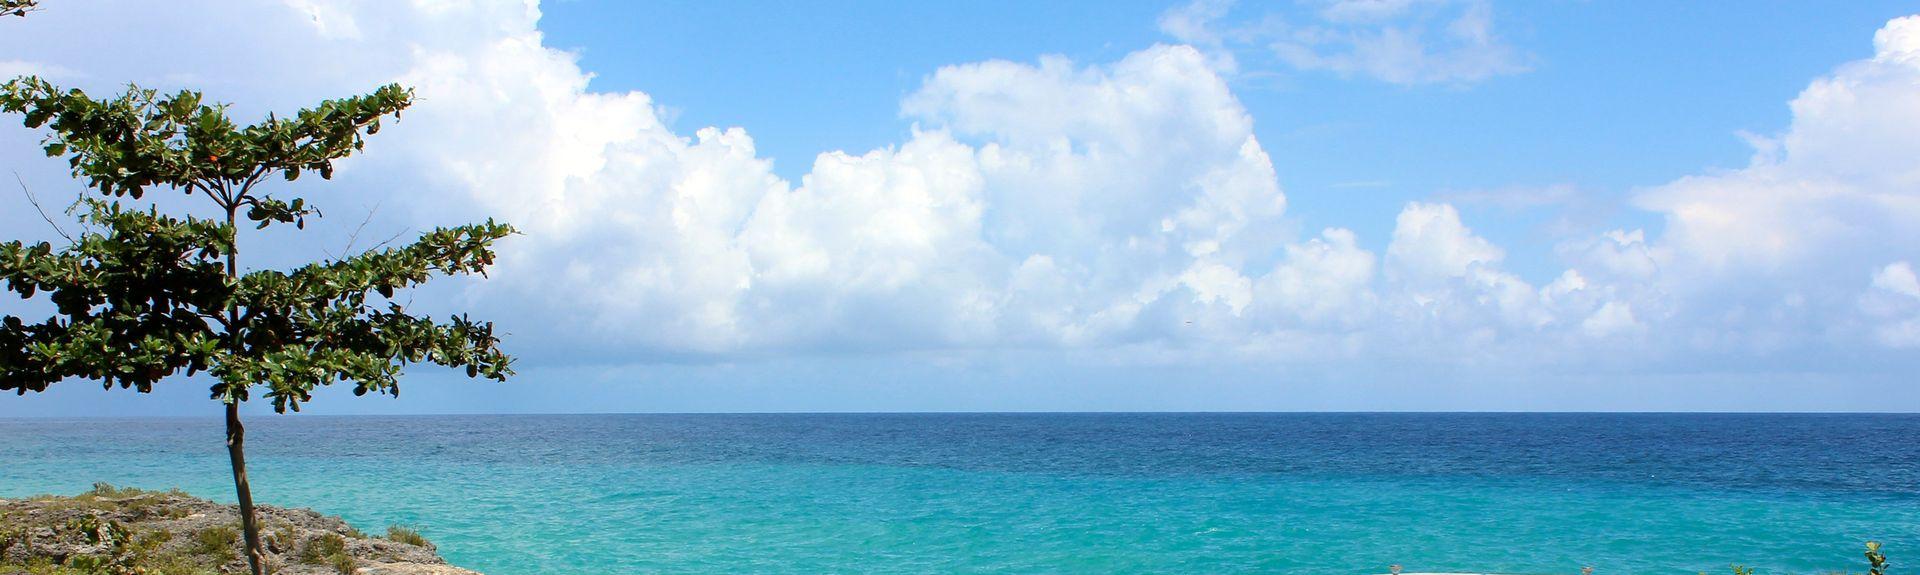 Mahogany Beach, Ocho Rios, Saint Ann, Jamaica